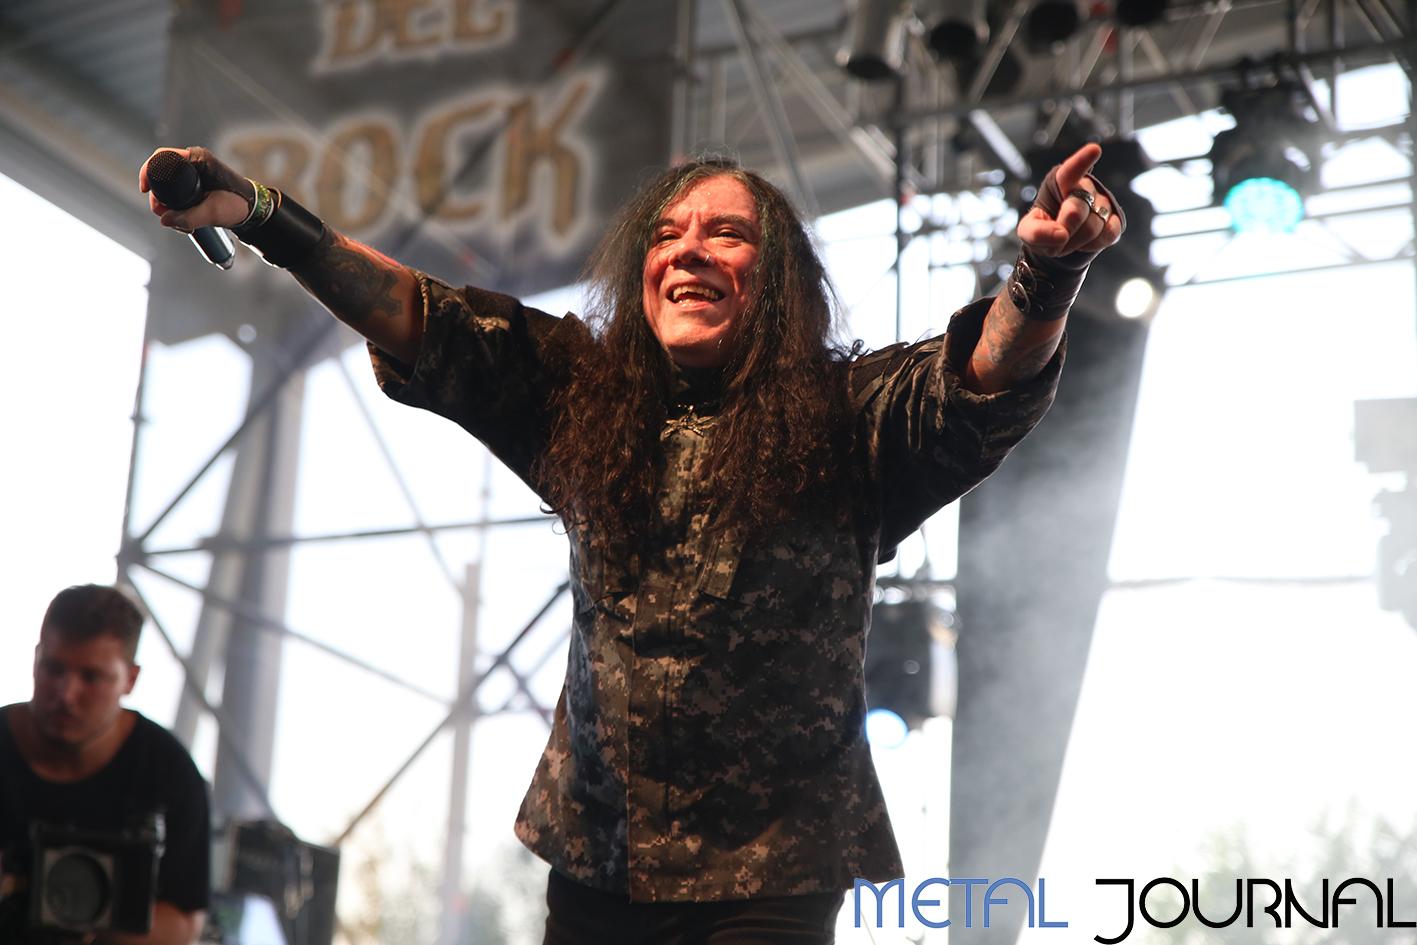 helstar - leyendas del rock 2019 metal journal pic 1